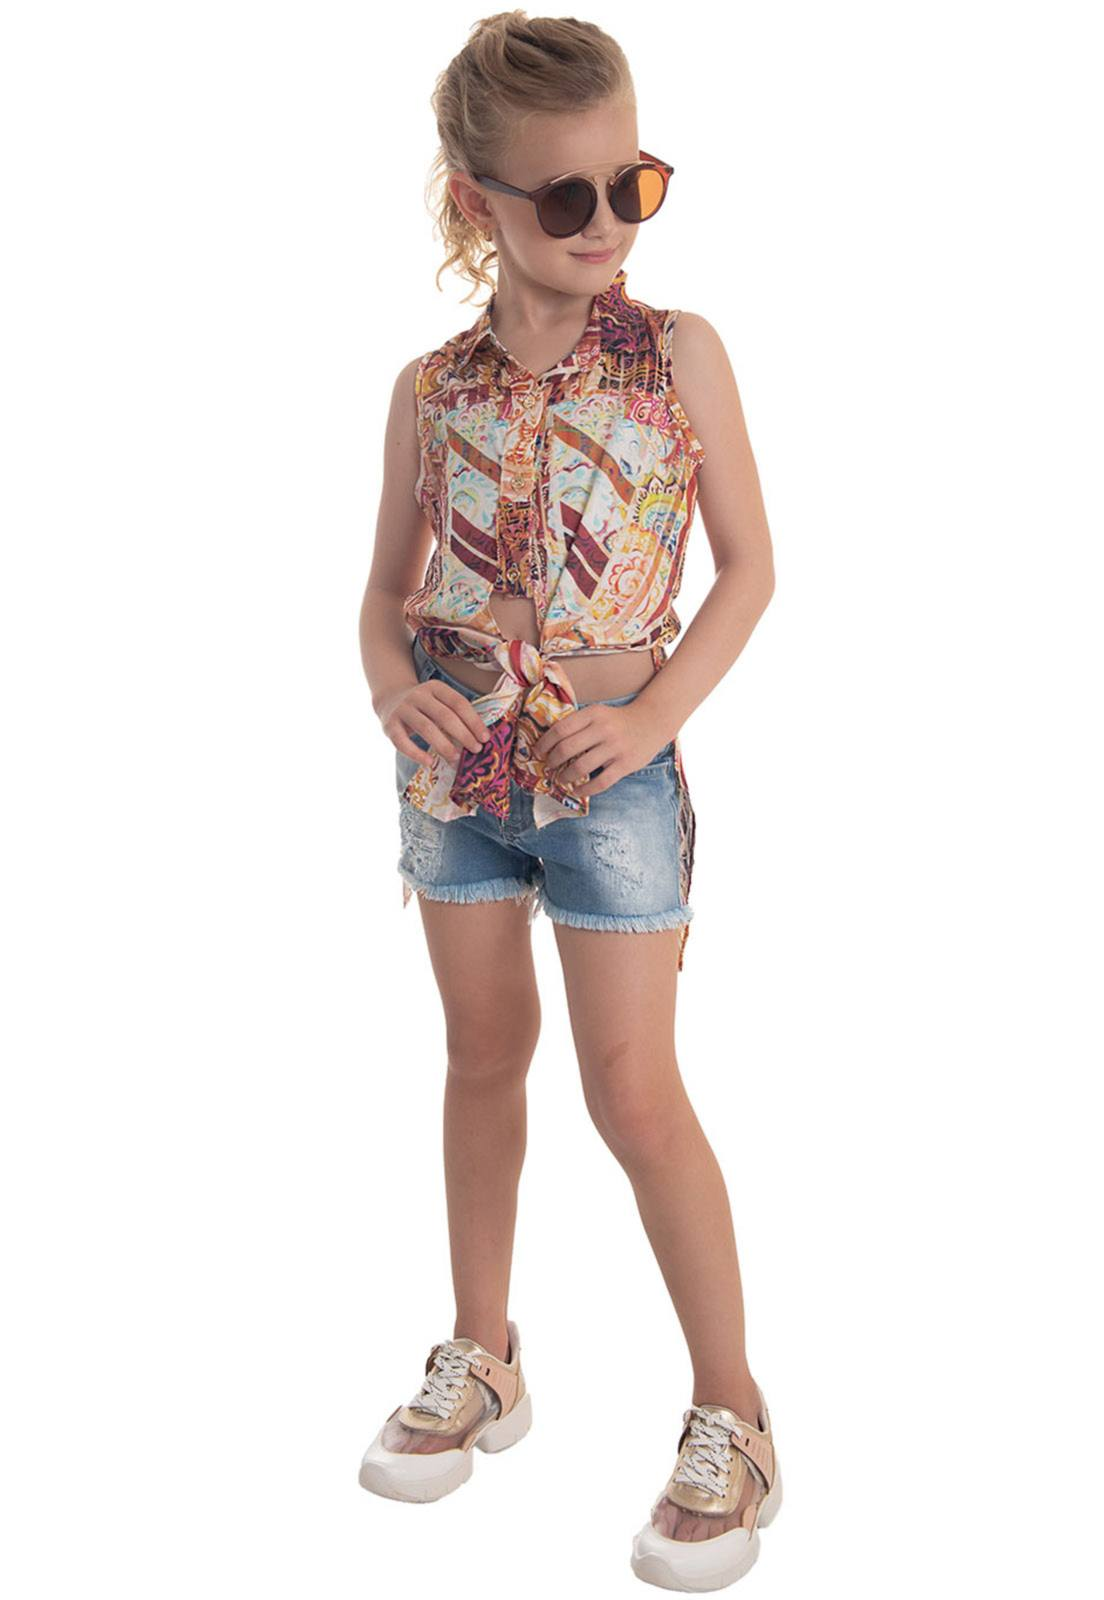 Conjunto Camisa Viscose Amarração, Shorts Jeans Destroyed